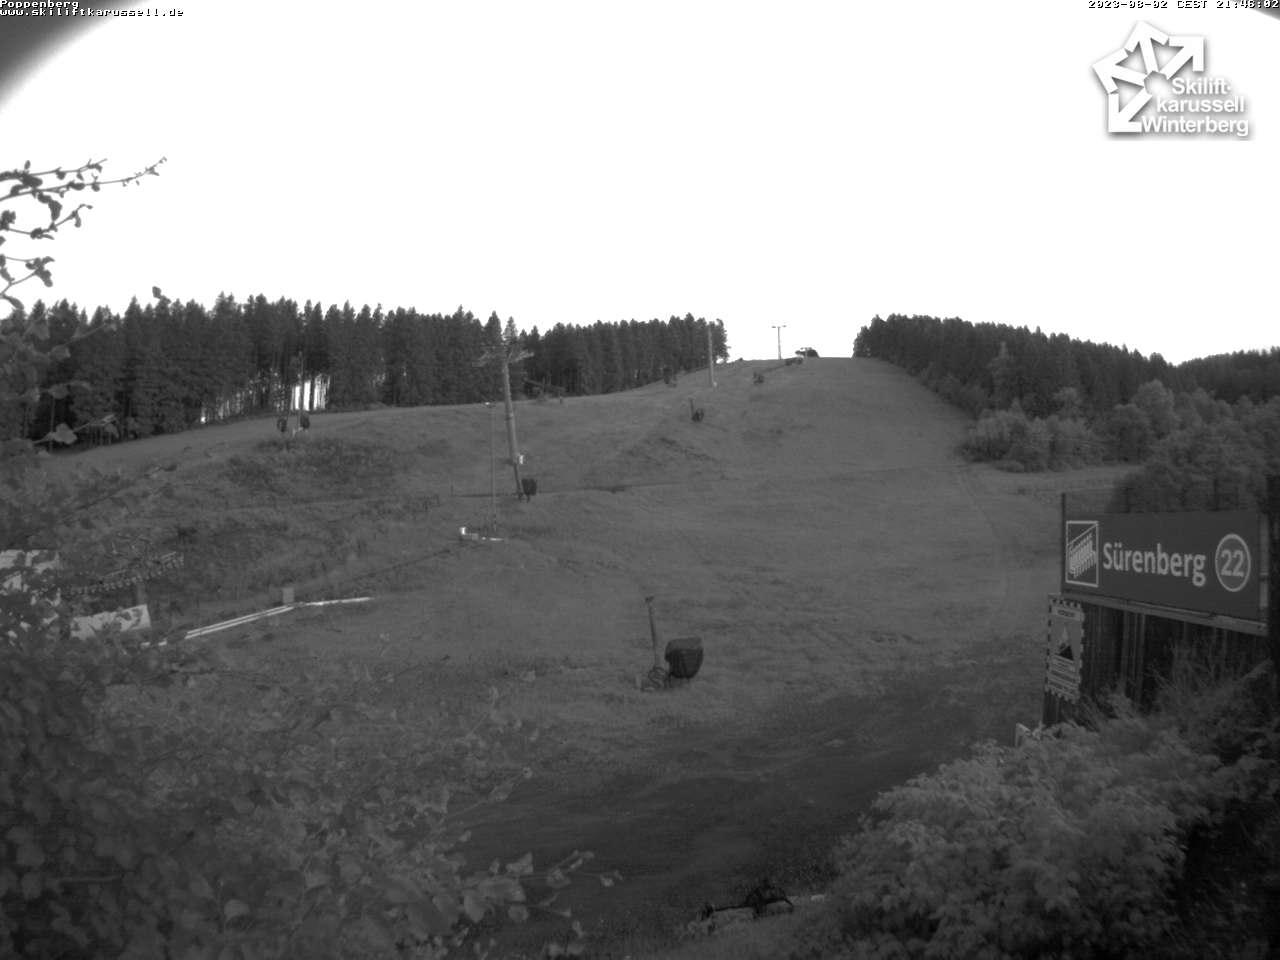 Skiliftkarussell Winterberg - Webcam 2